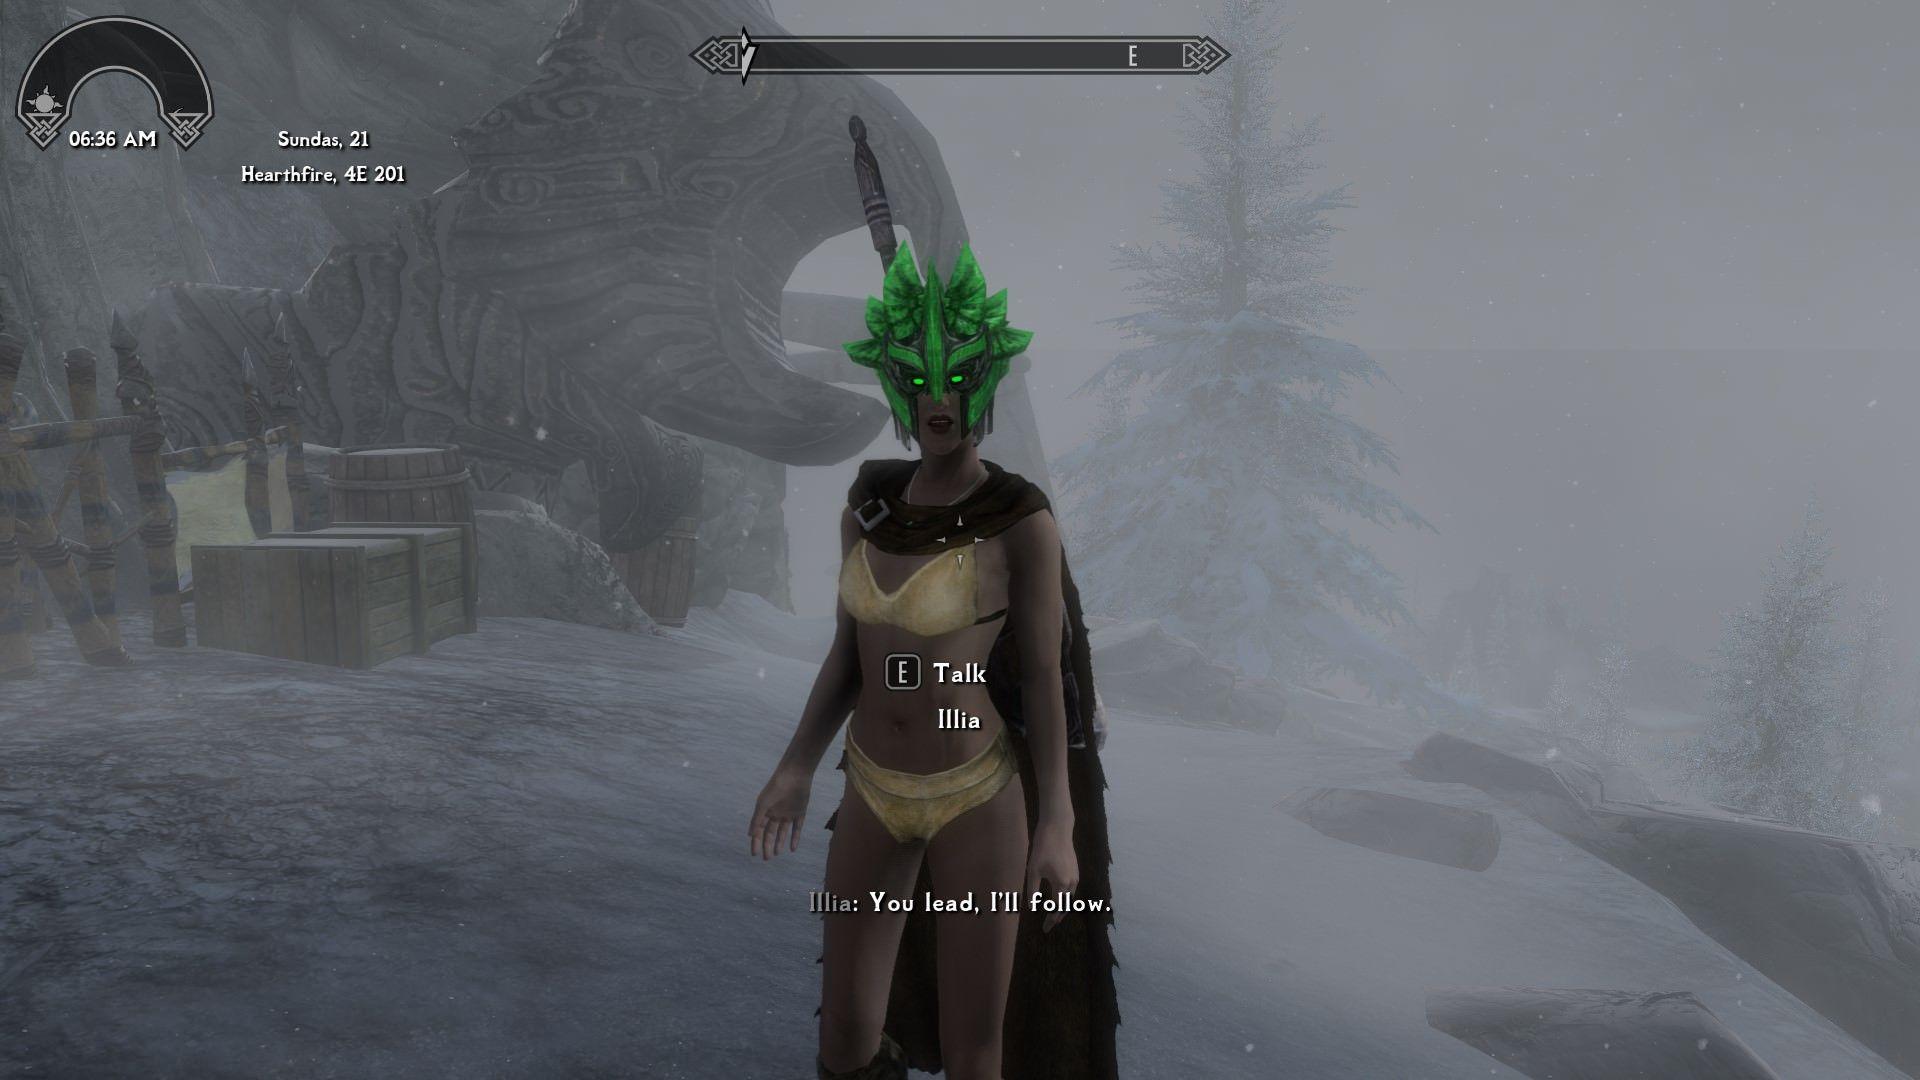 I gave Illia a helmet when suddenly a masked vigilante